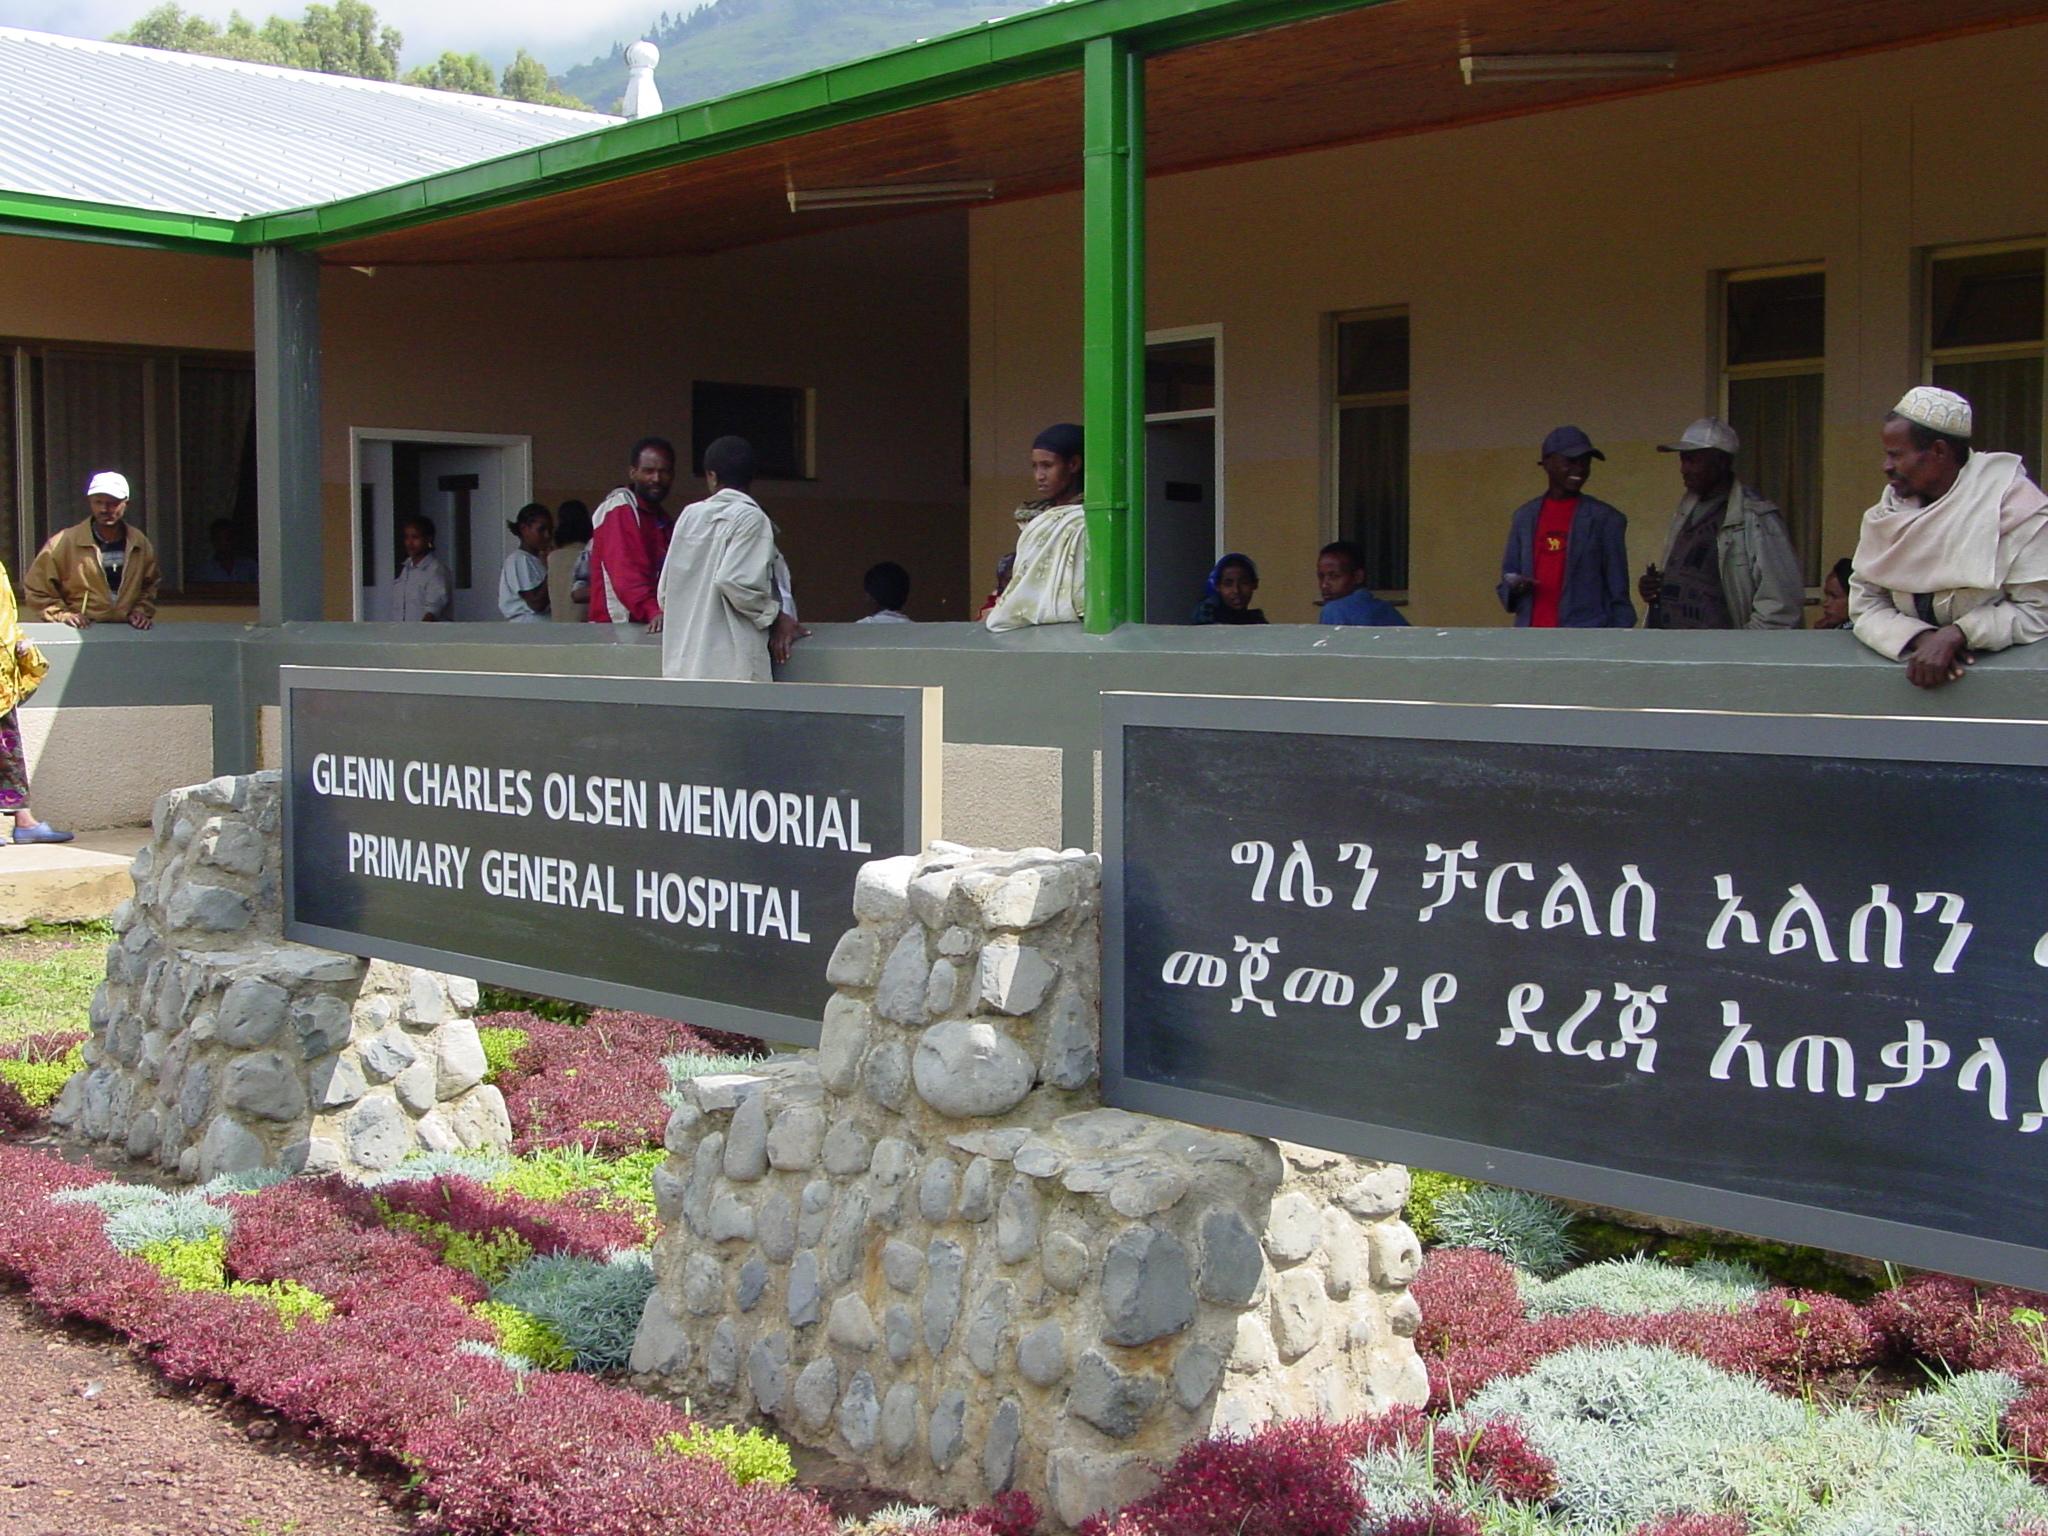 Hesperian Health Guides for Rural Communities